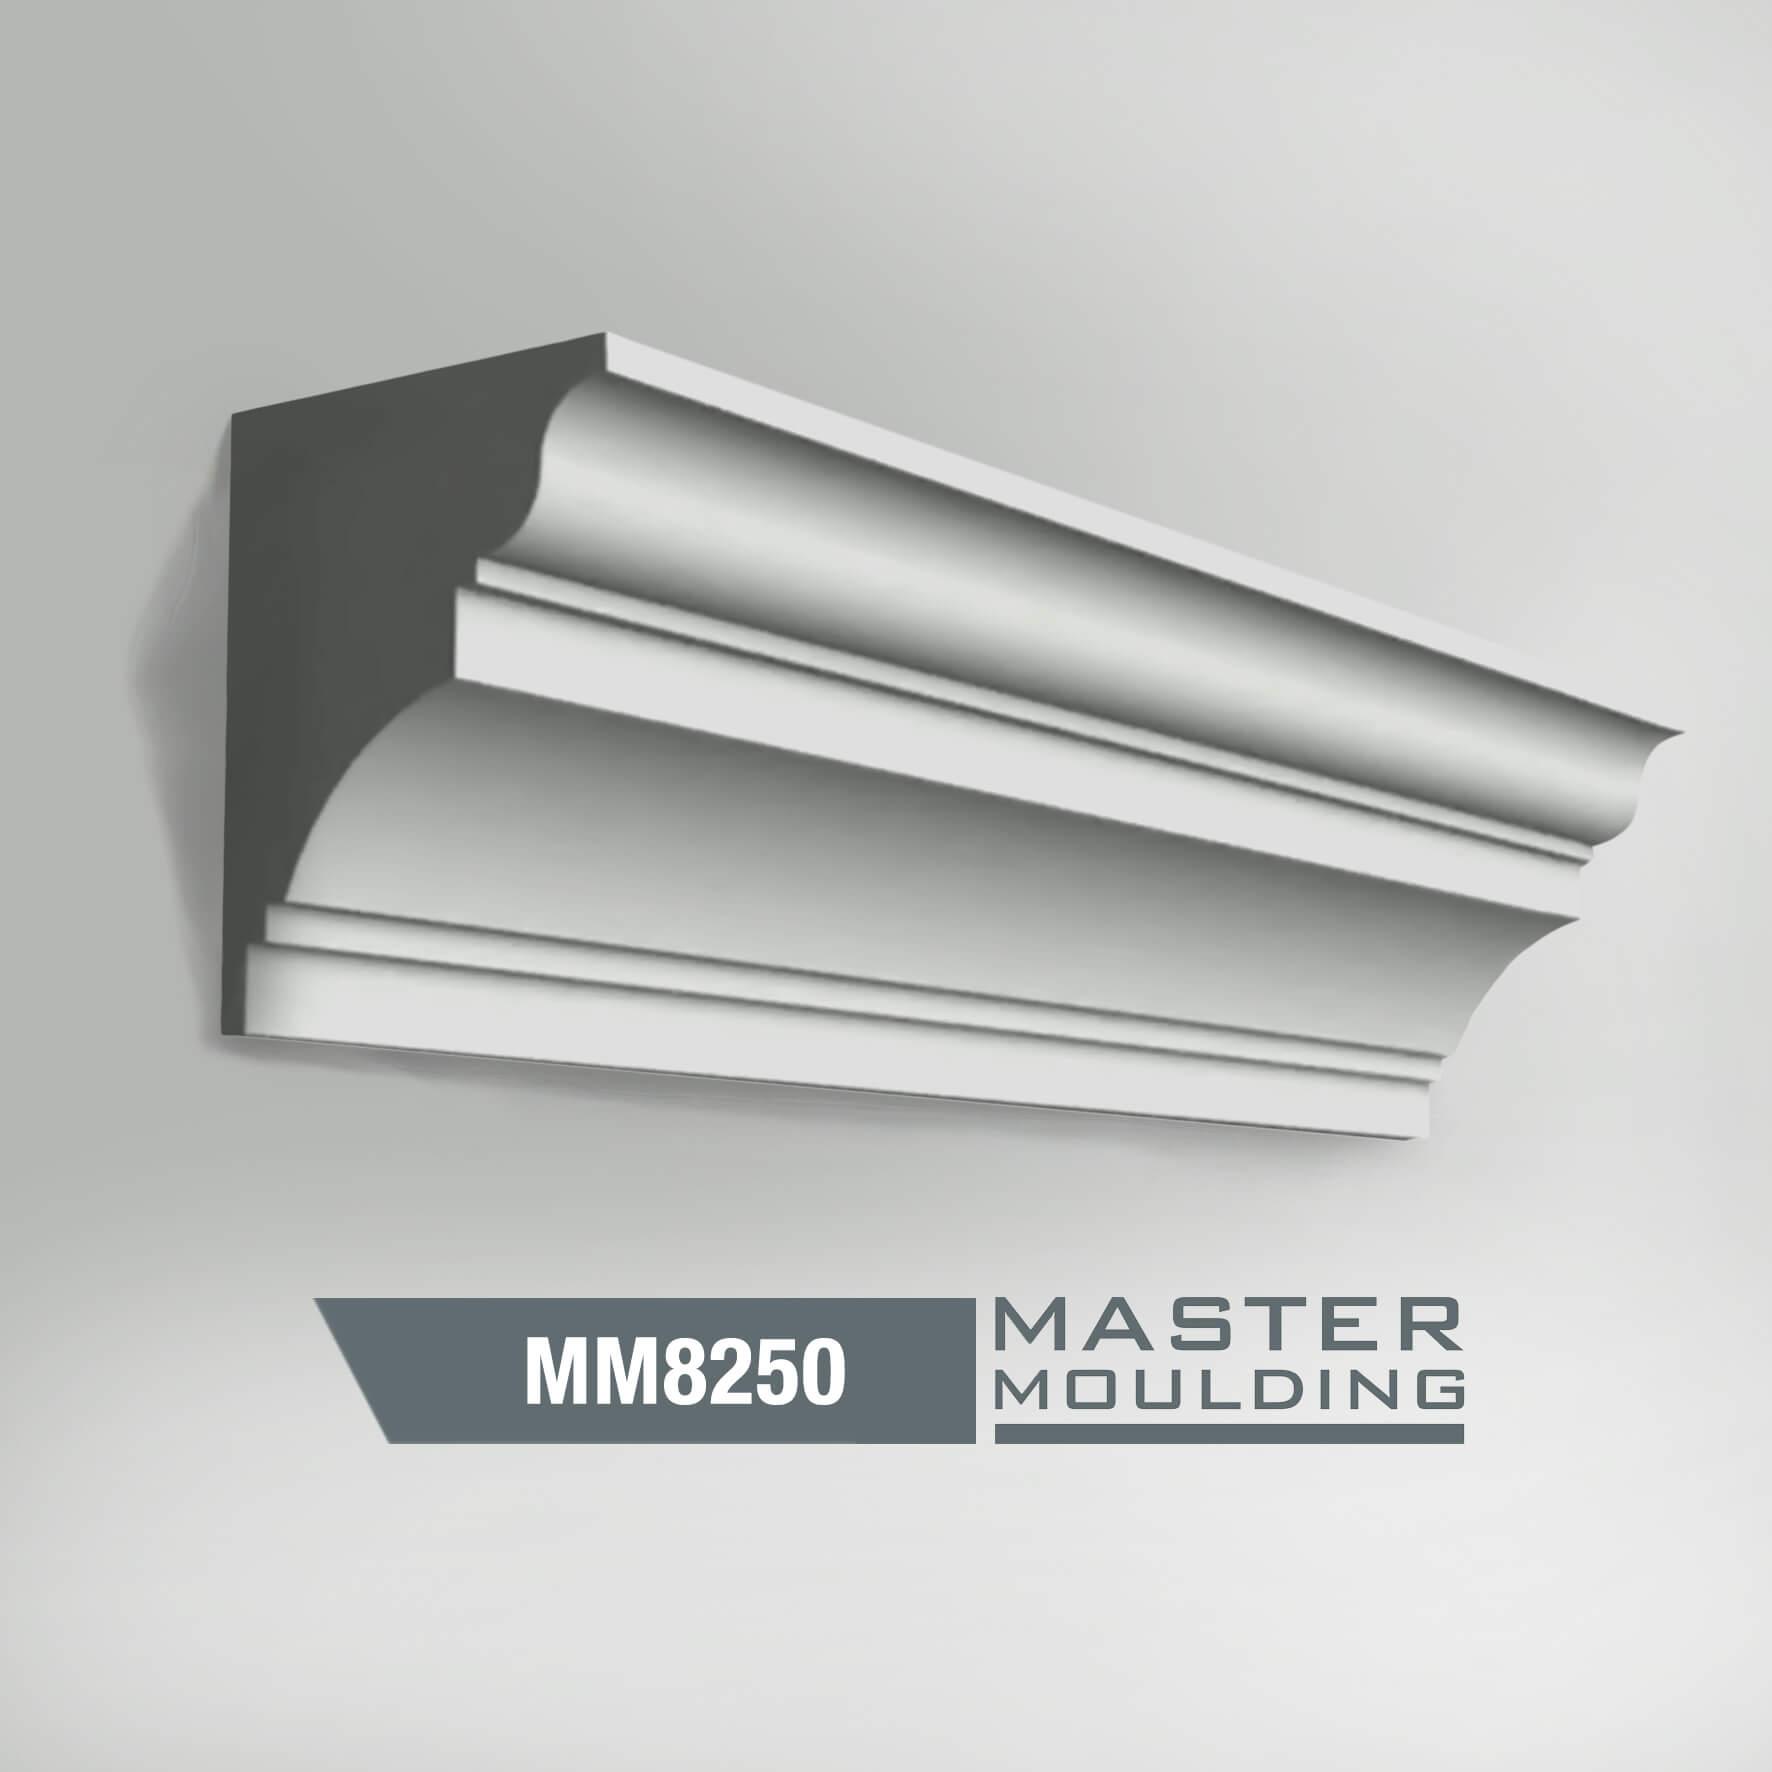 MM8250